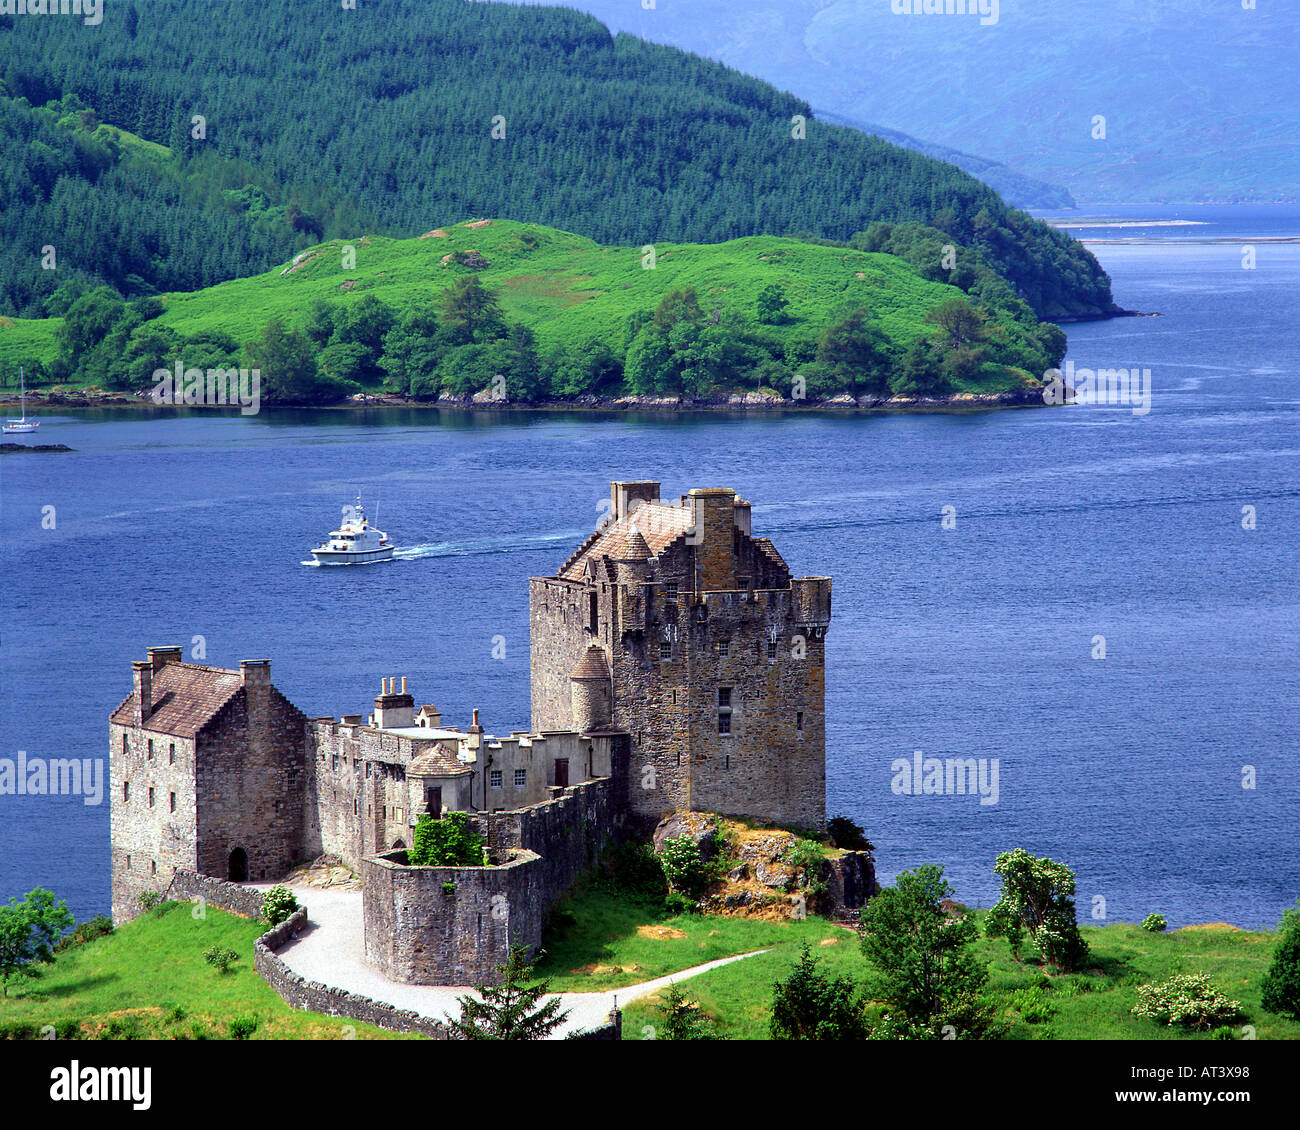 GB - SCHOTTLAND: Eilean Donan Castle in den Highlands Stockbild